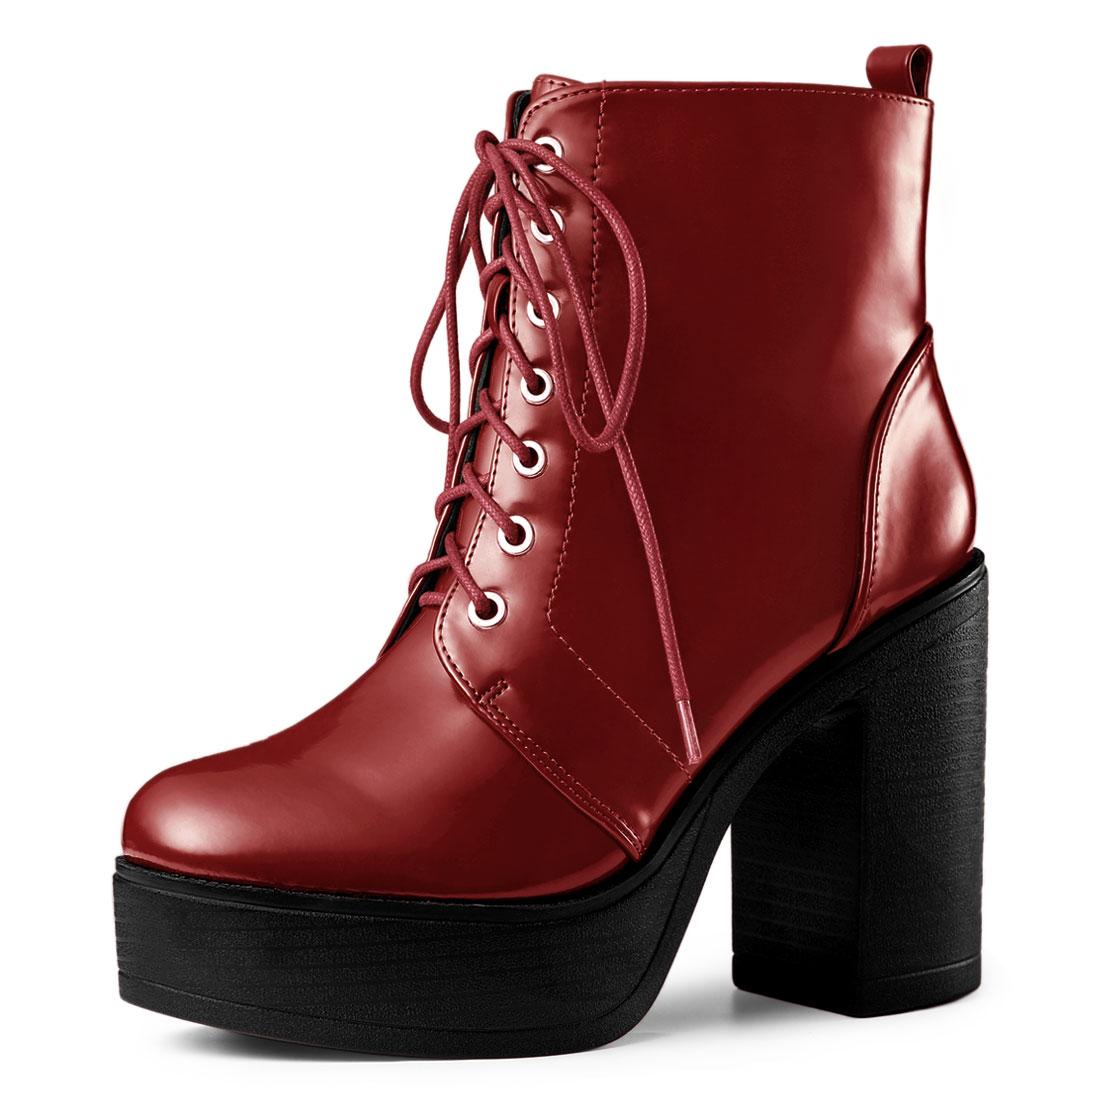 Allegra K Women's Platform Chunky High Heel Lace Up Combat Boots Red US 8.5